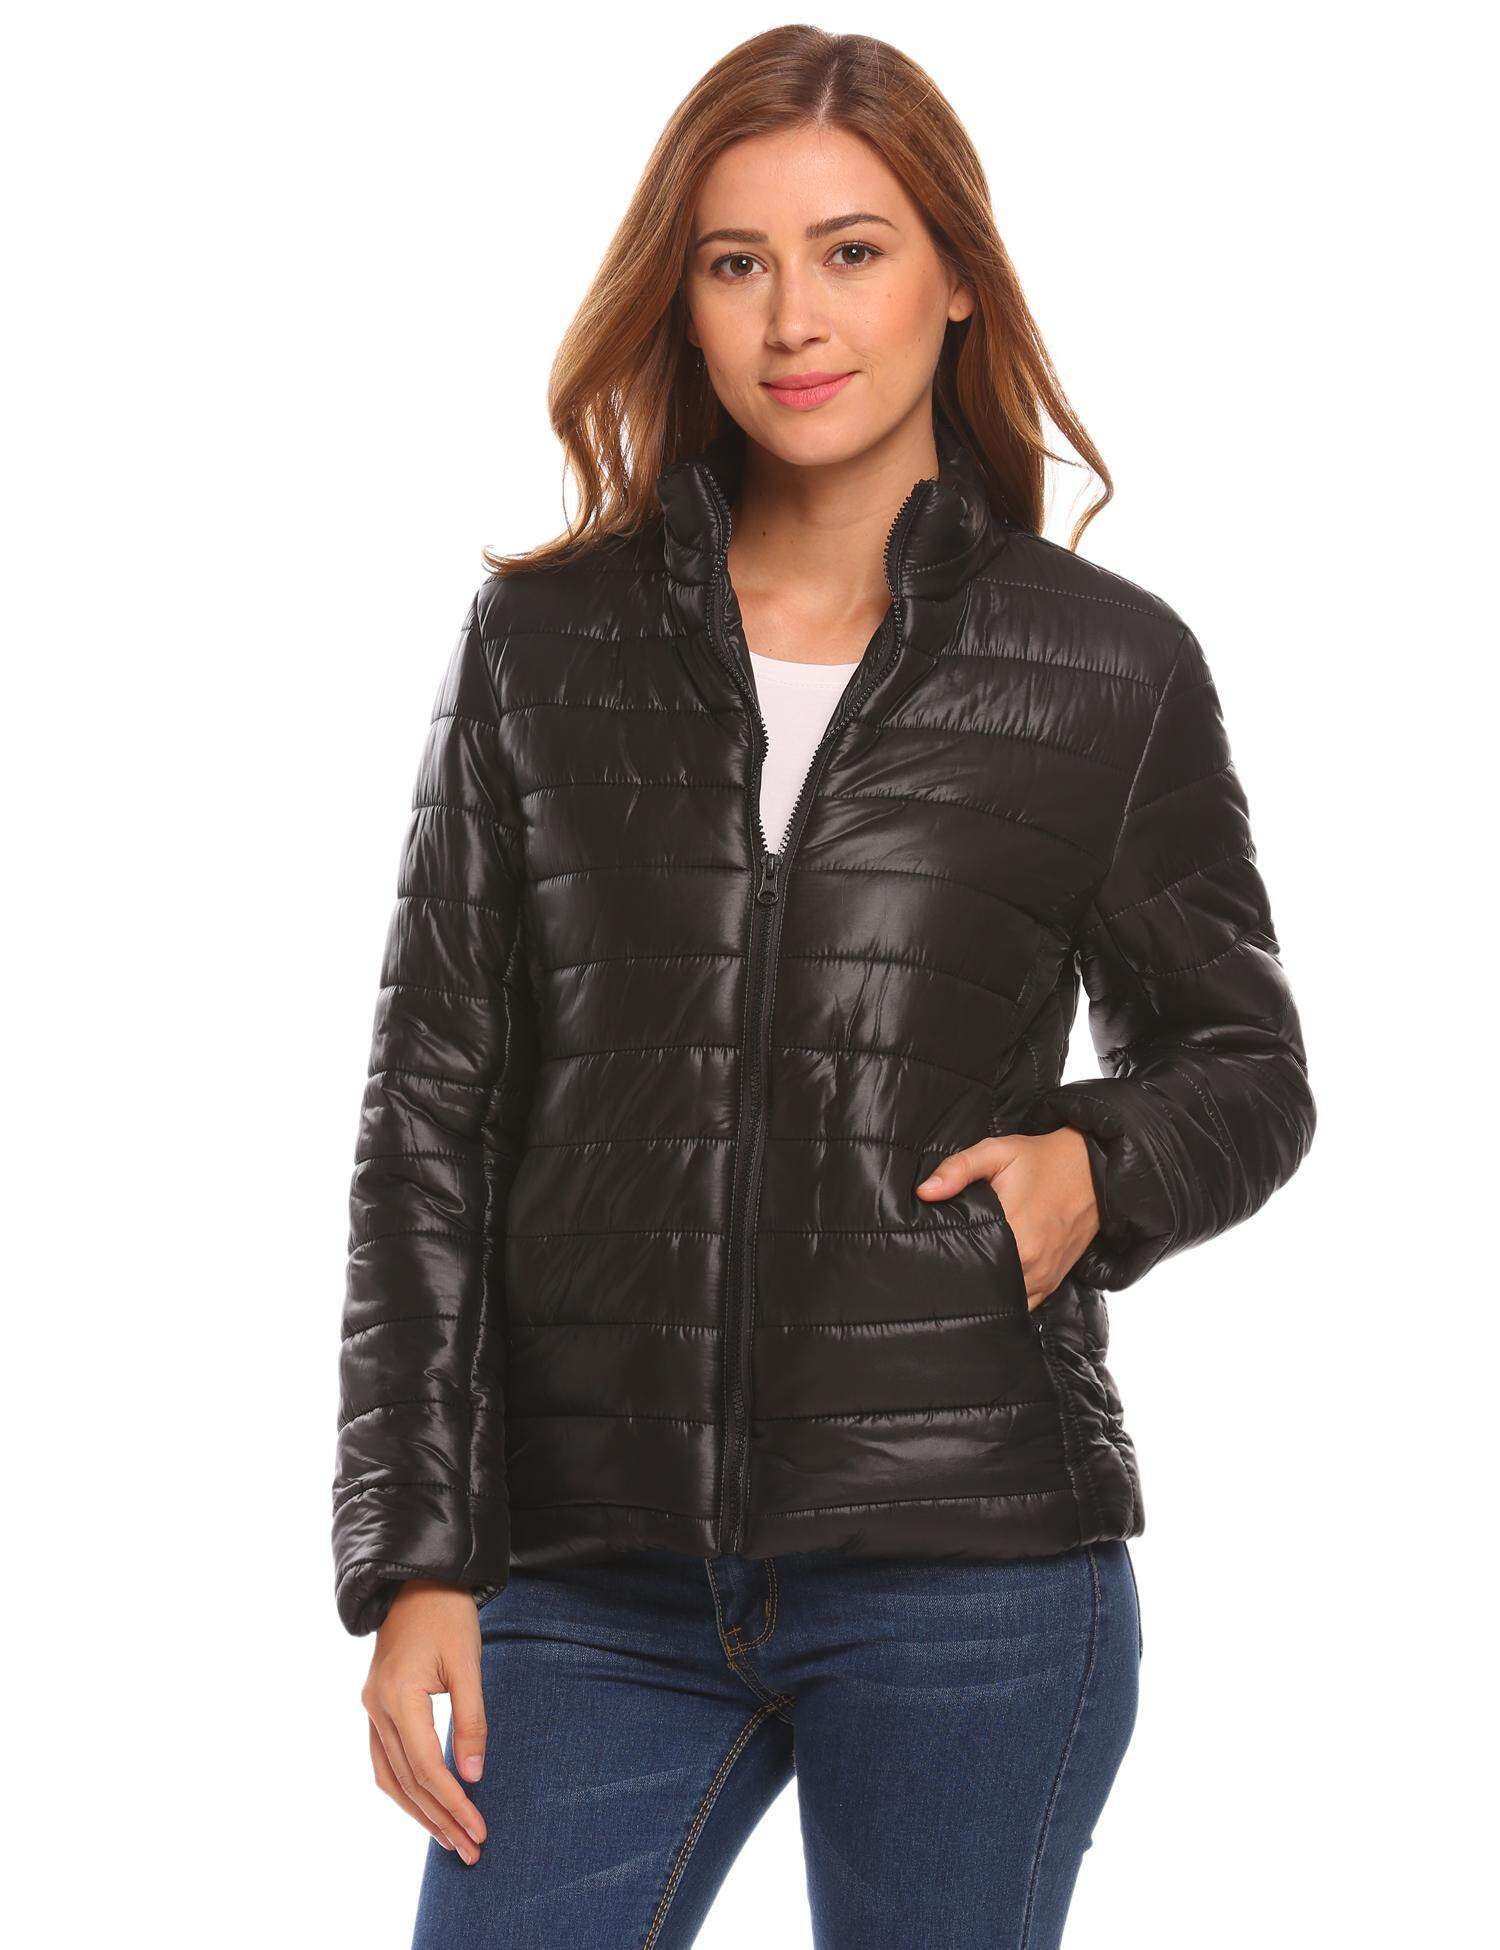 Harga Murah Sunwonder dan Wanita Zip Up Jaket Bulu Angsa Kasual Kerah Lurus Lengan Panjang (Hitam)-Intl